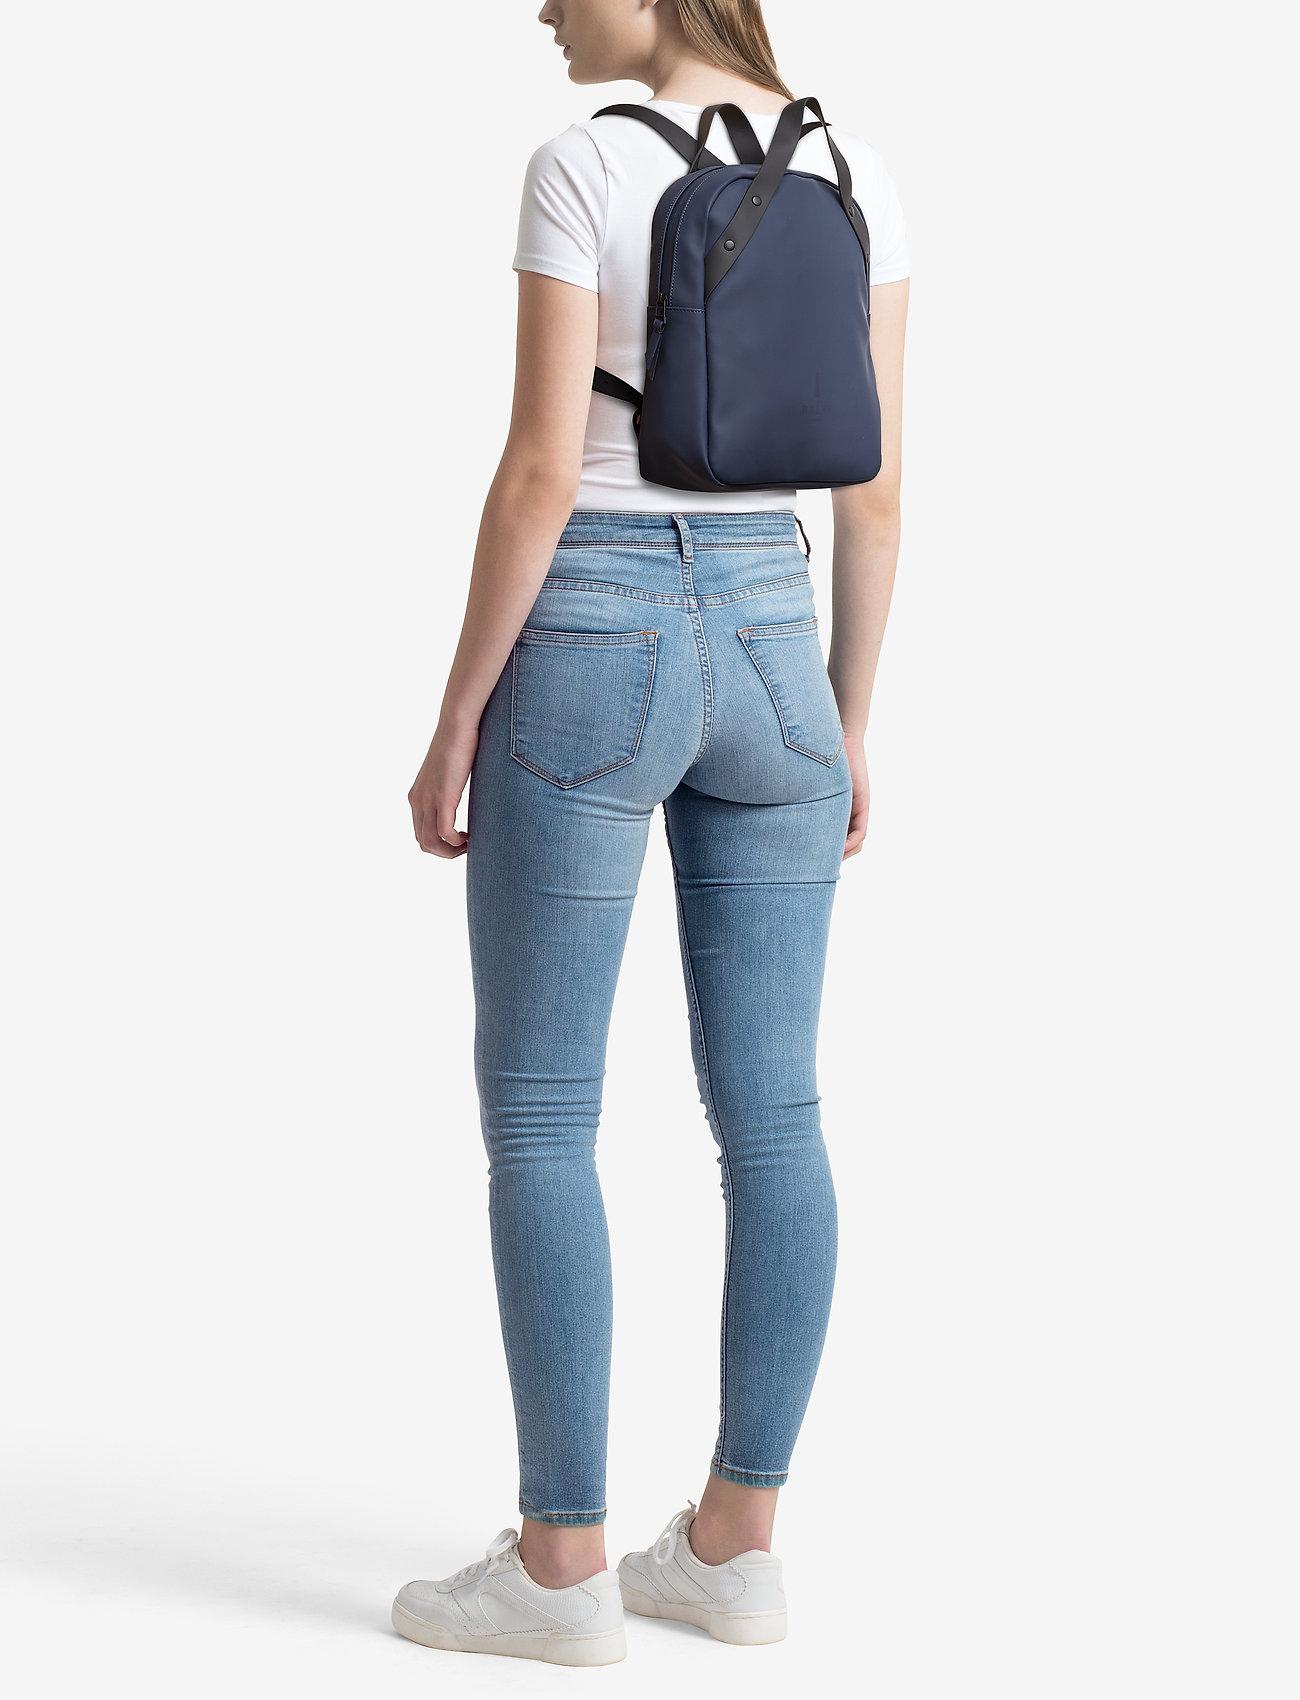 Rains Backpack Go - 02 BLUE